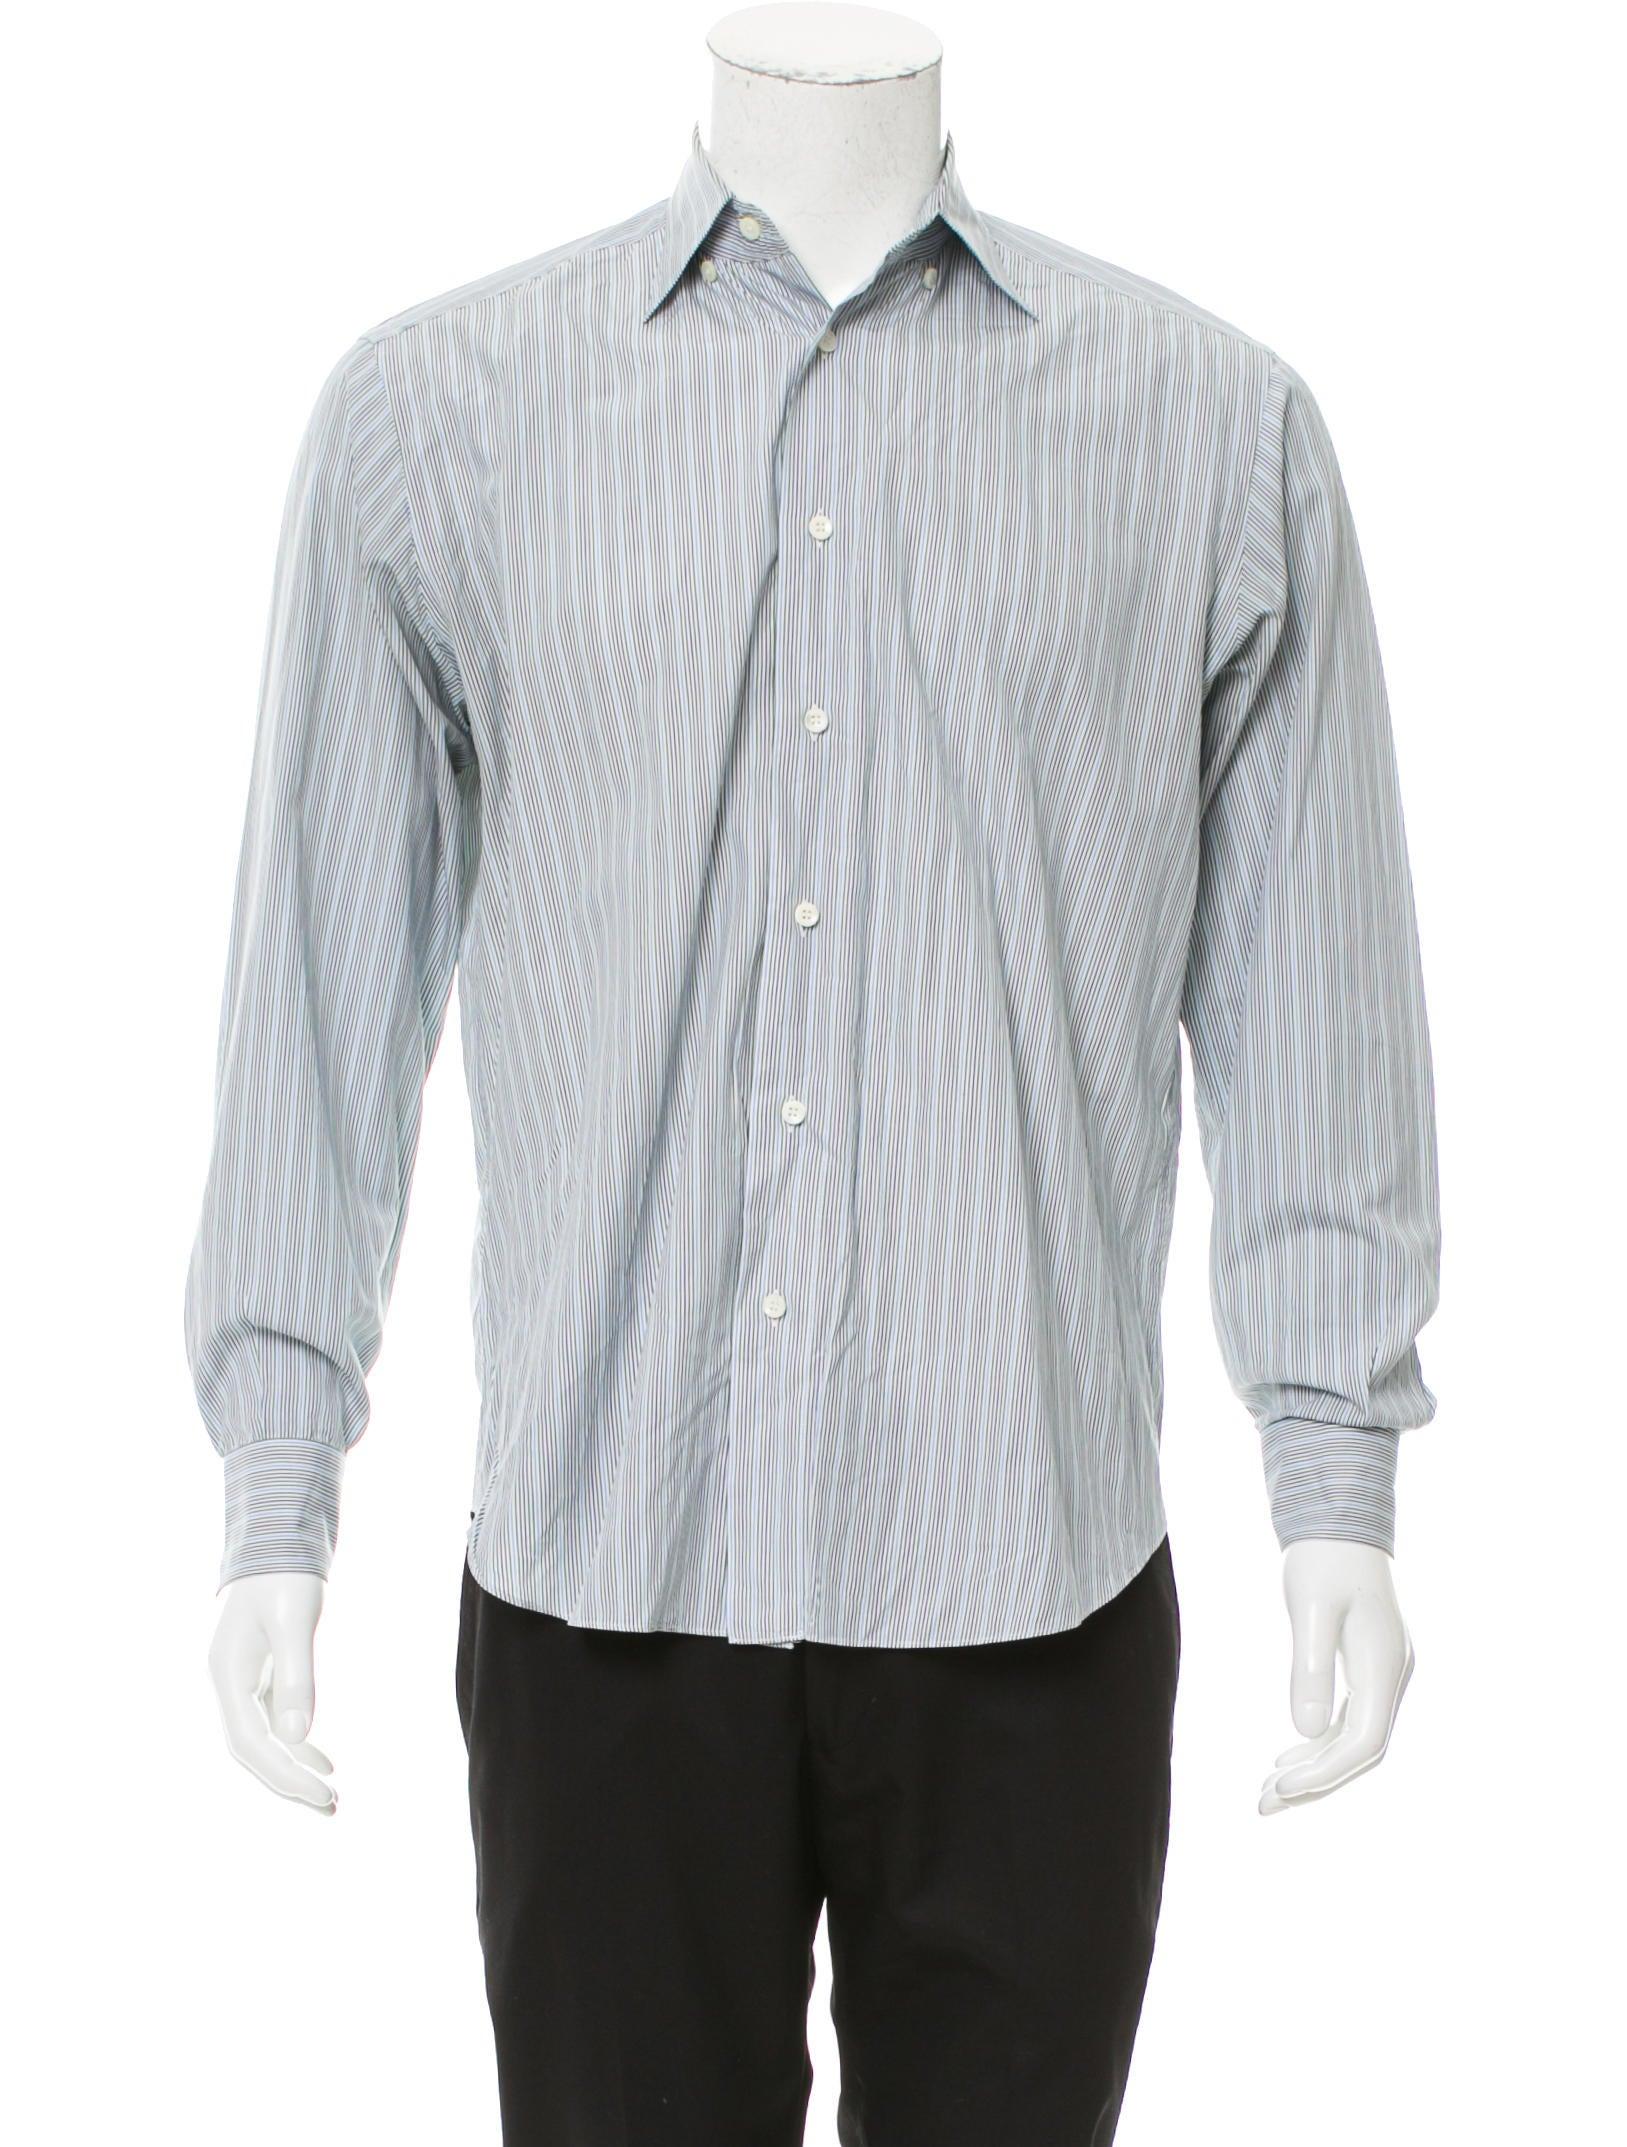 Brioni striped button up shirt clothing bro21912 the for Striped button up shirt mens